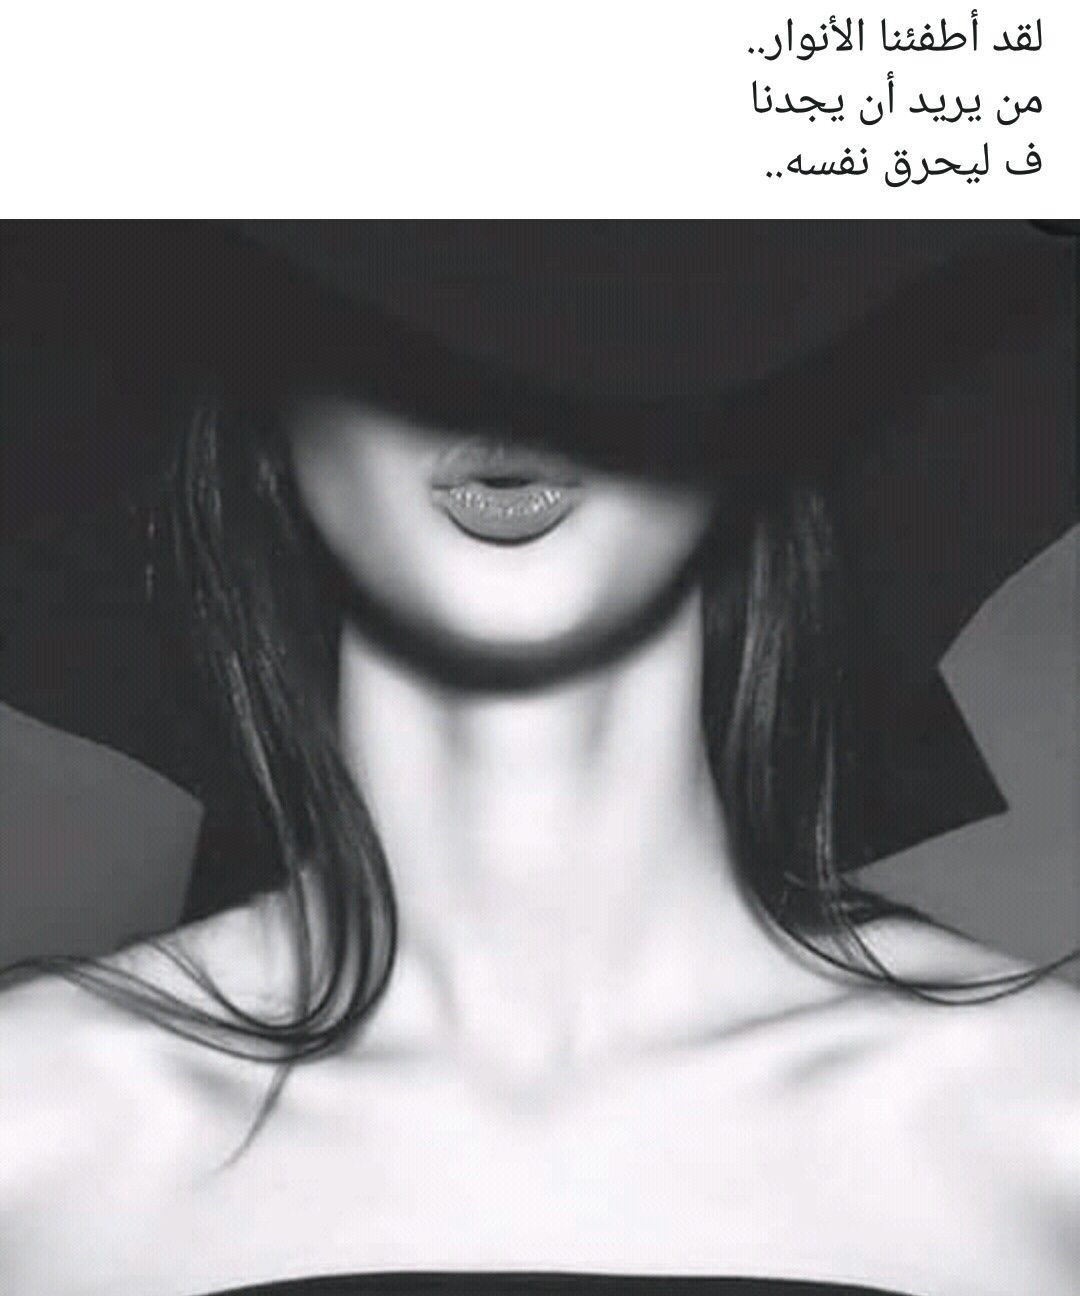 لانني انثى عمياء Beautiful Arabic Words Arabic Quotes Funny Arabic Quotes